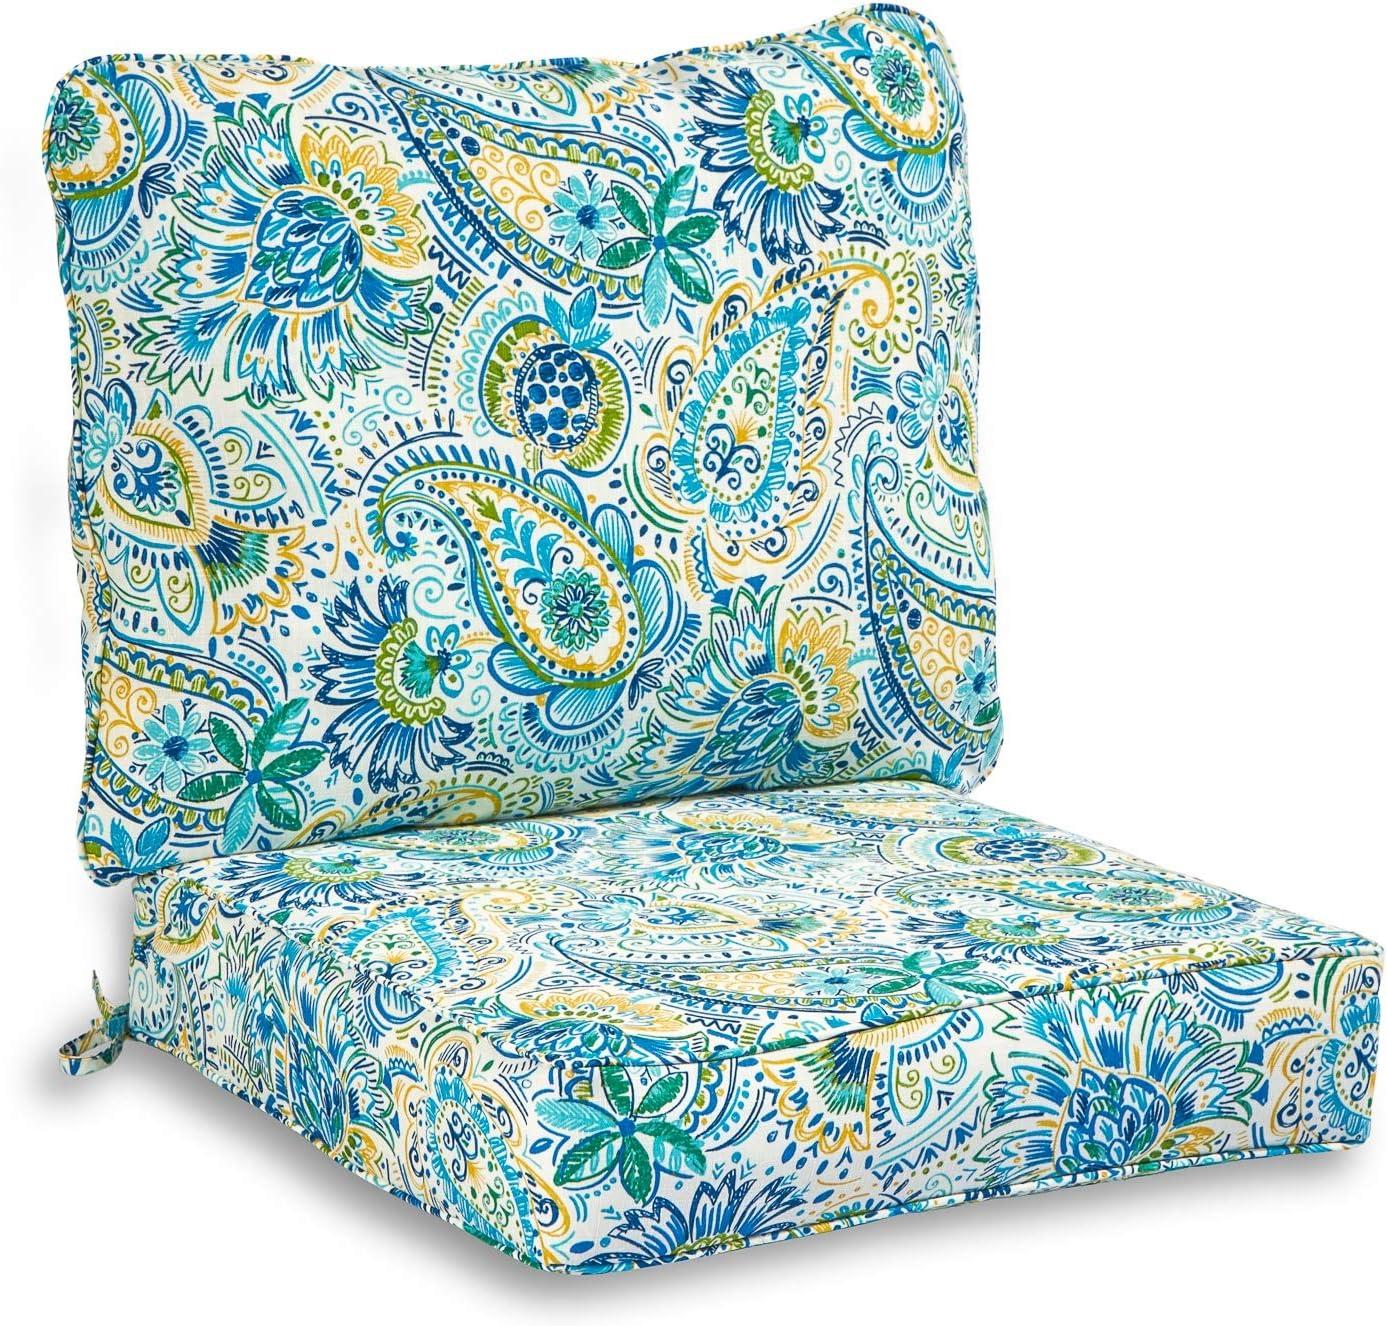 South Pine trust Porch Outdoor Baltic 2-Piece Deep Cushio OFFicial shop Seat Paisley